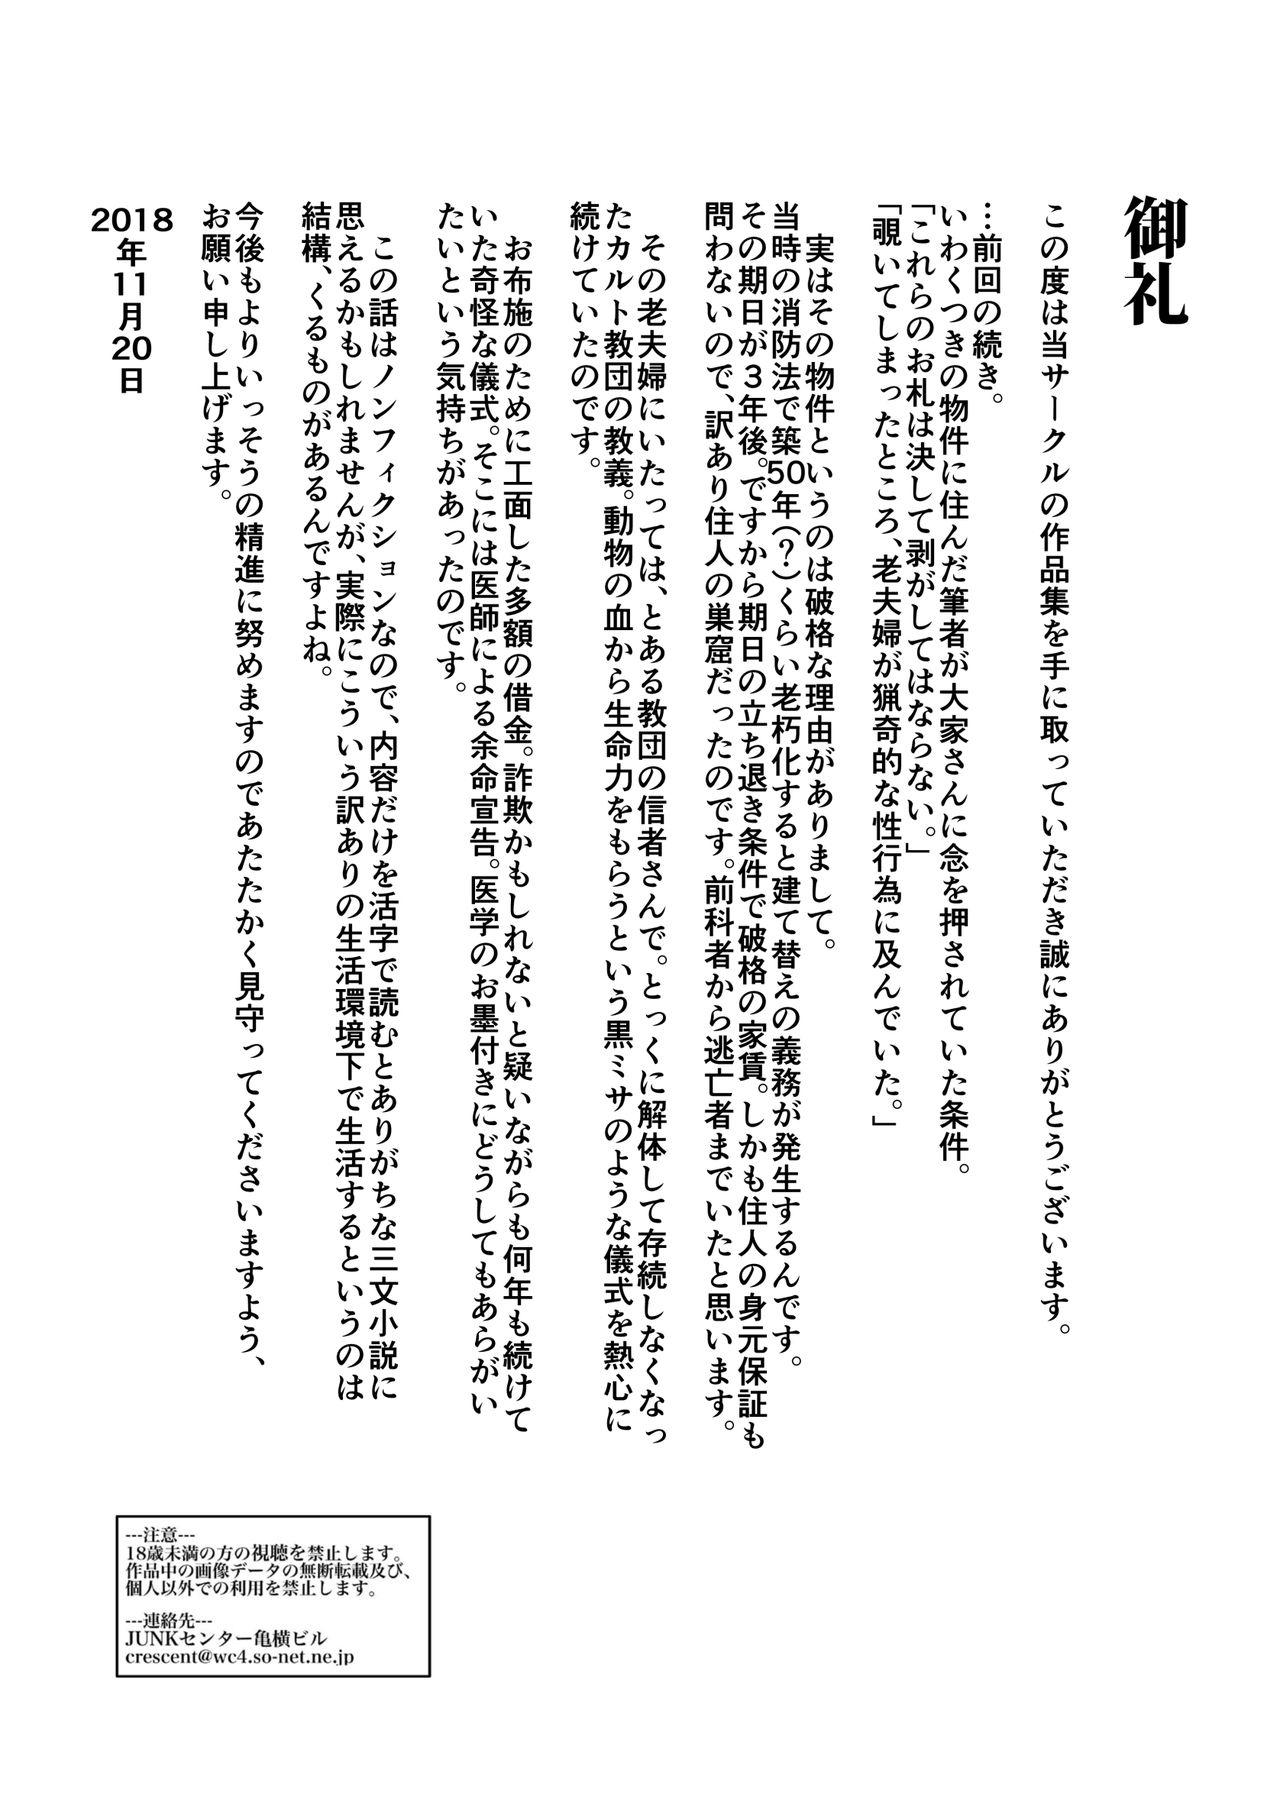 Isogasii Okaasan No Tamuno Sasa Rouzin Seikaigo | Guide for Elderly Sex Health Care to Busy Mom 73